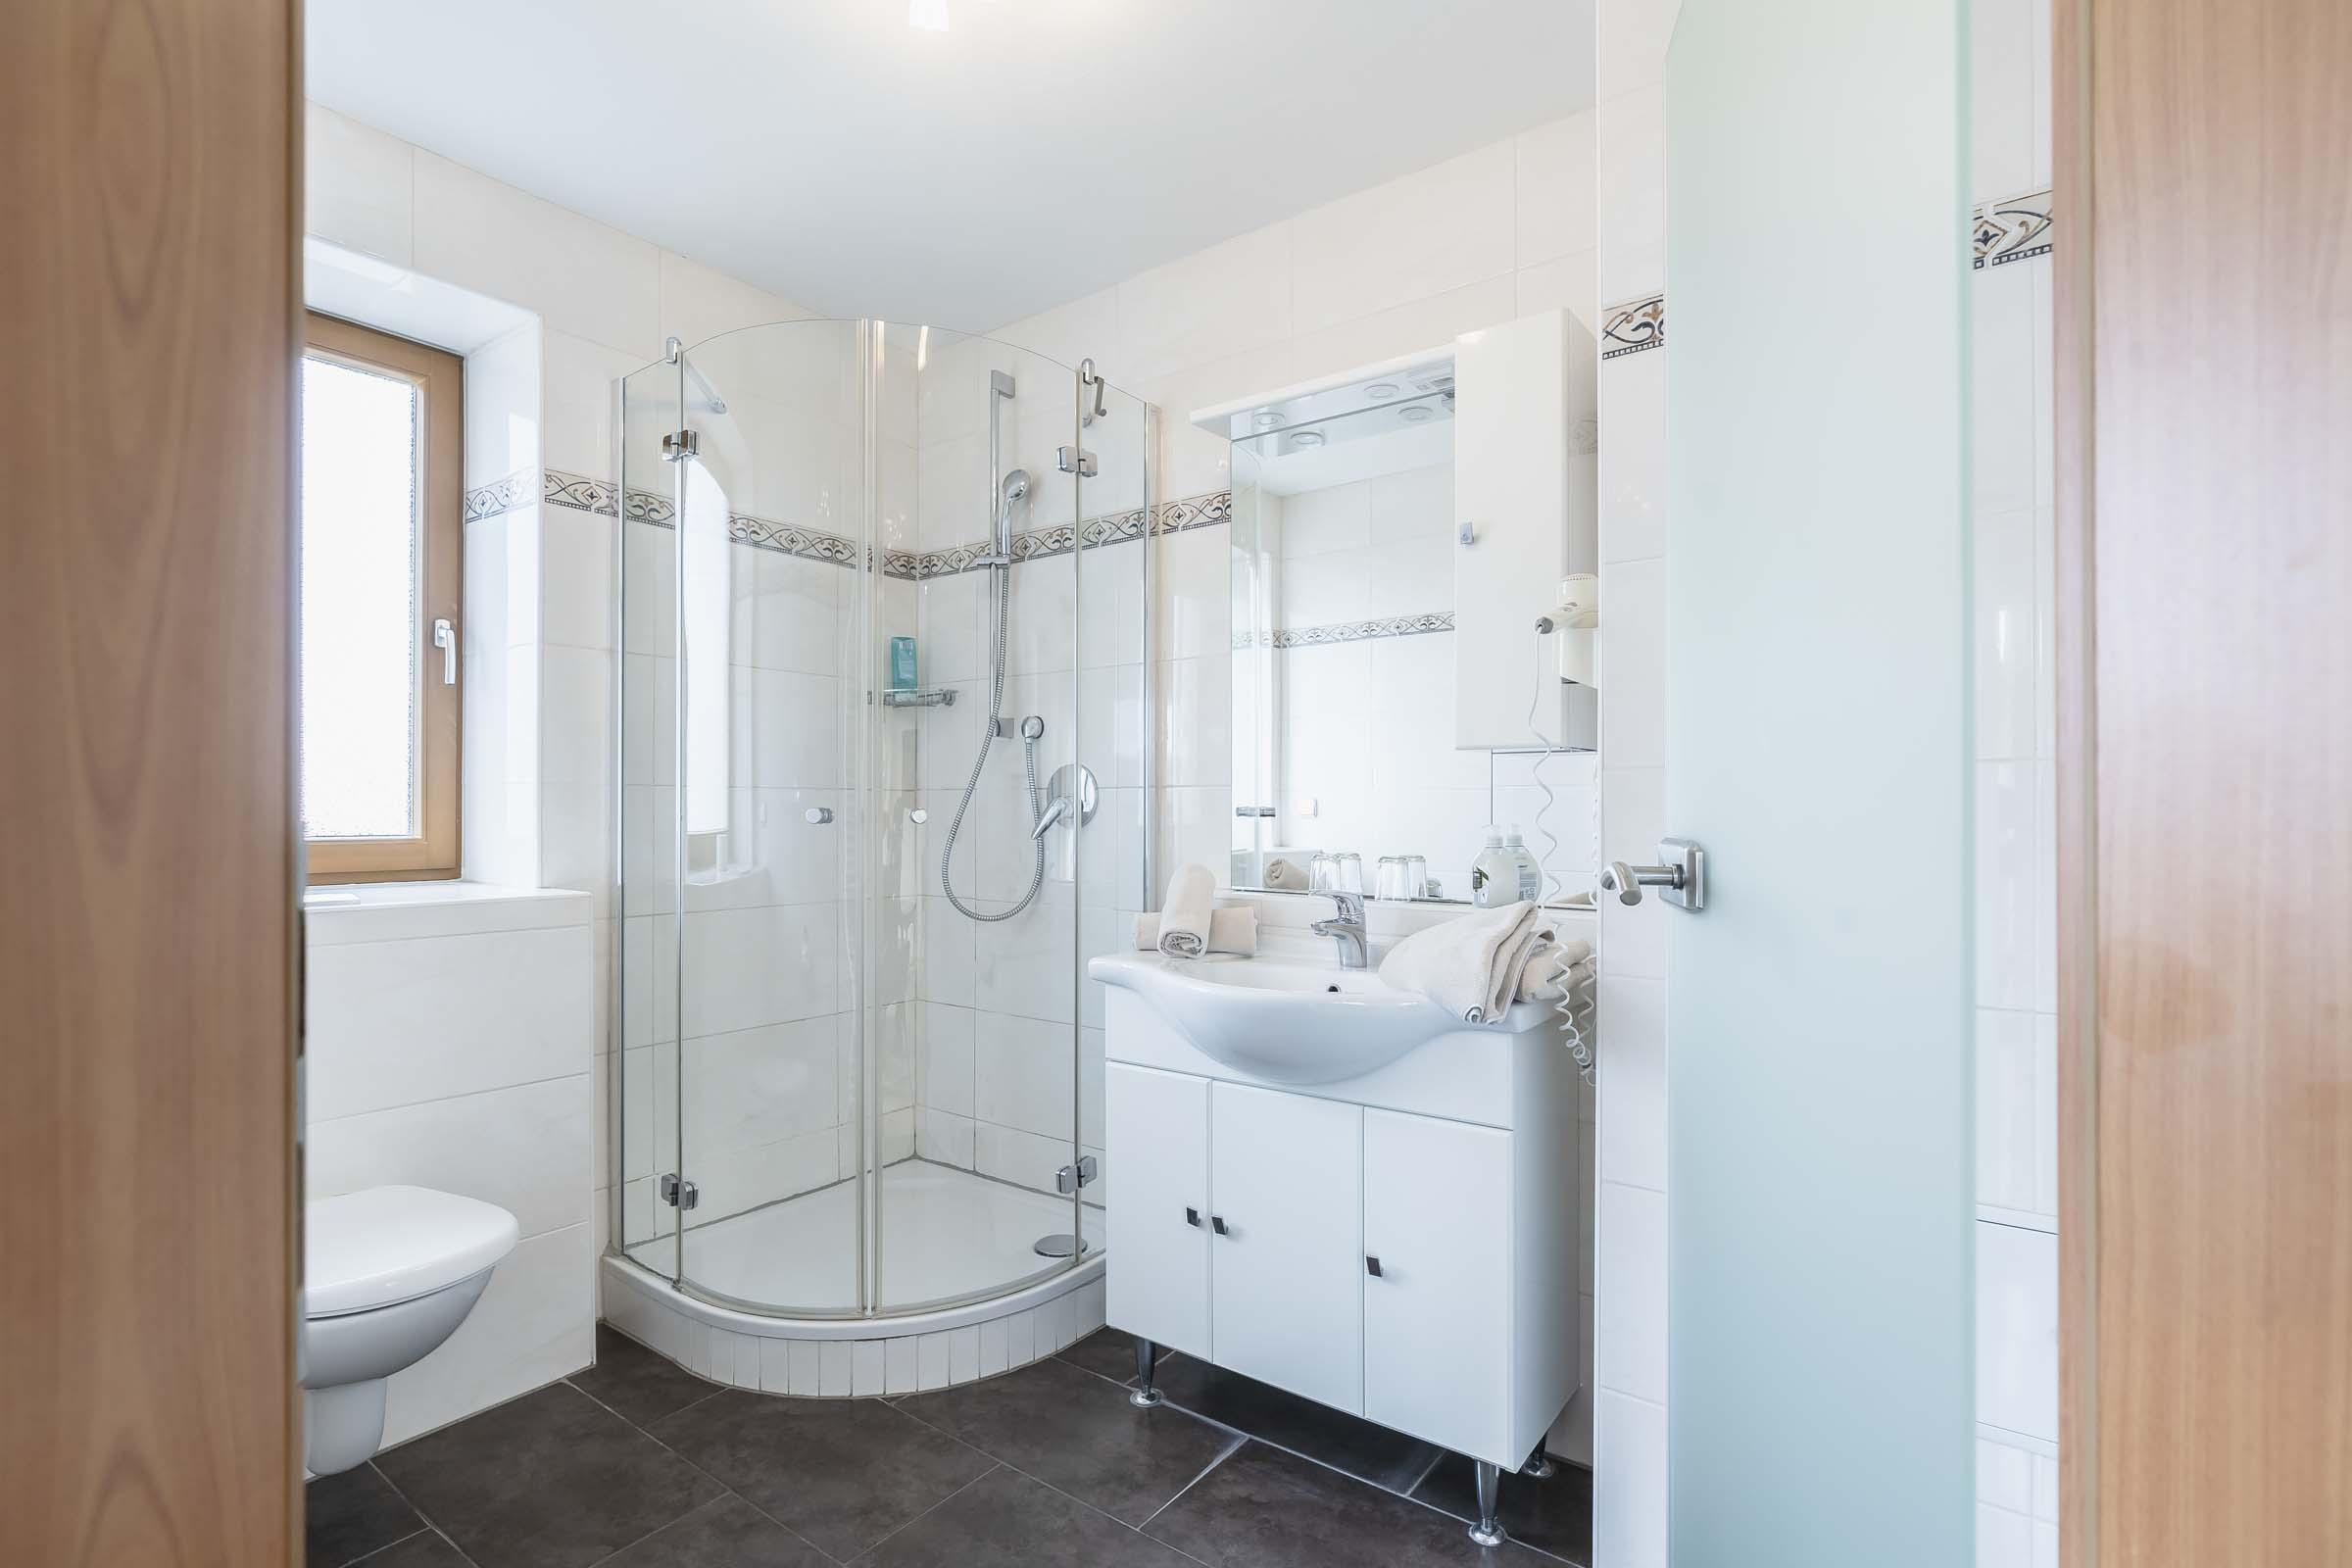 Hotel Haus Am Gries Murnau Double Room Balcony Bathroom